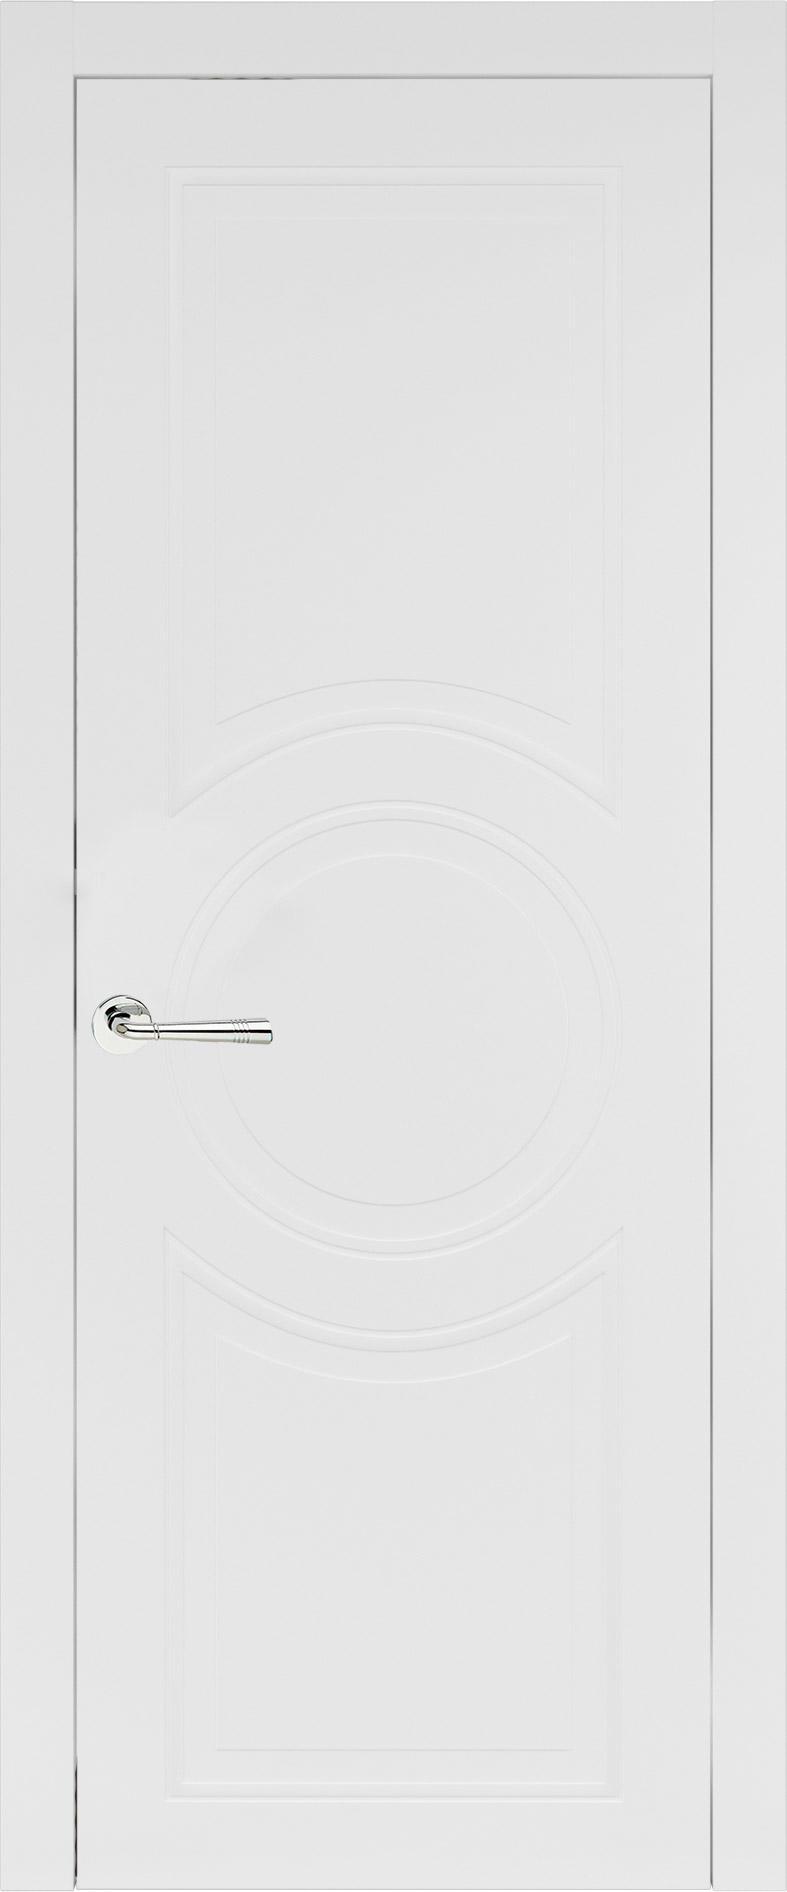 Ravenna Neo Classic цвет - Белая эмаль (RAL 9003) Без стекла (ДГ)